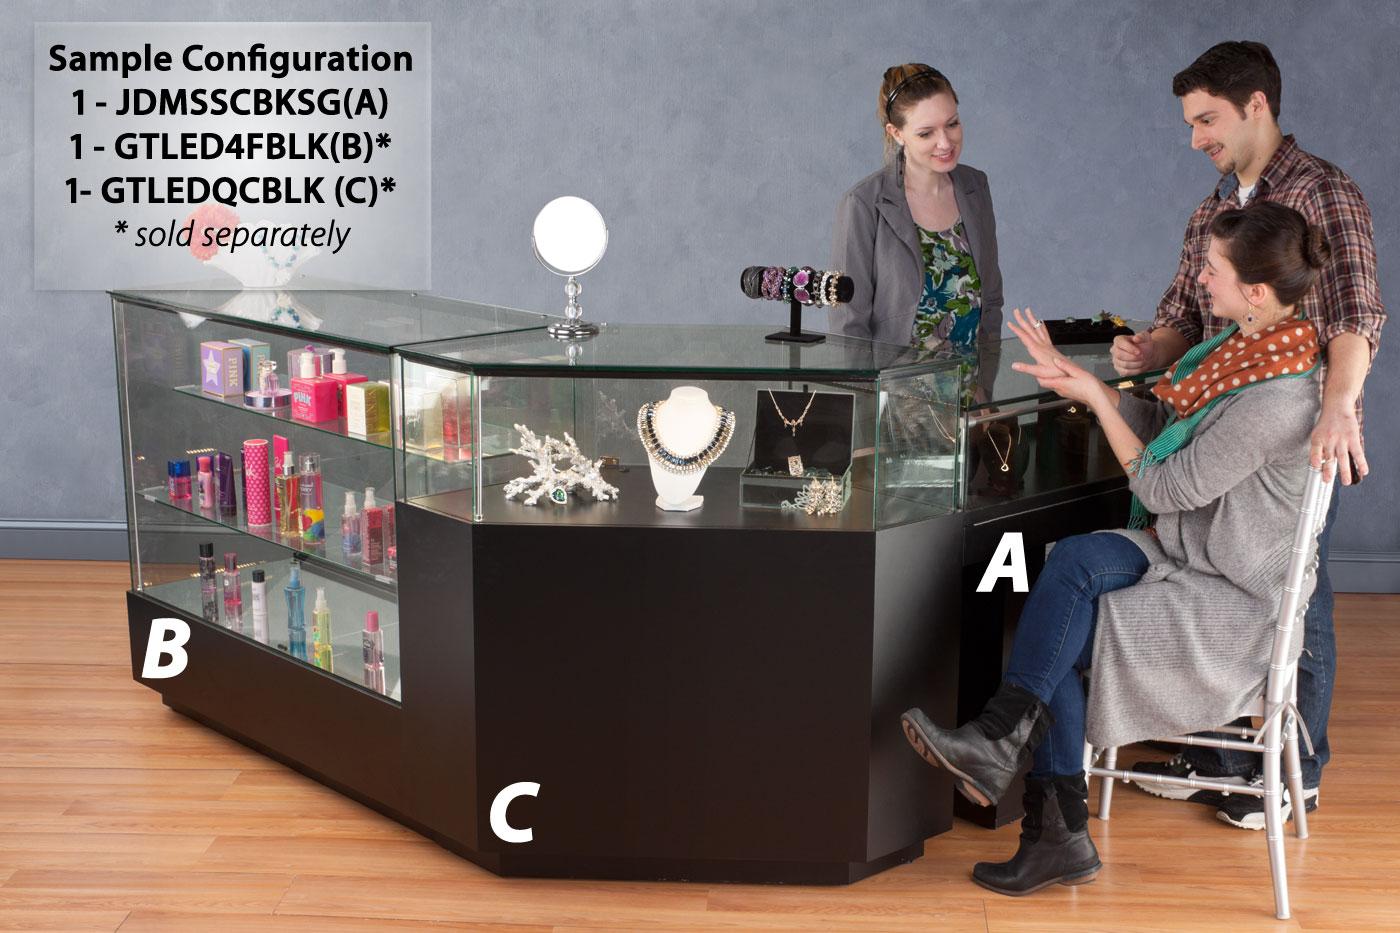 Semi-Gloss Black Jewelry Display Case with Hydraulic Lift Opening